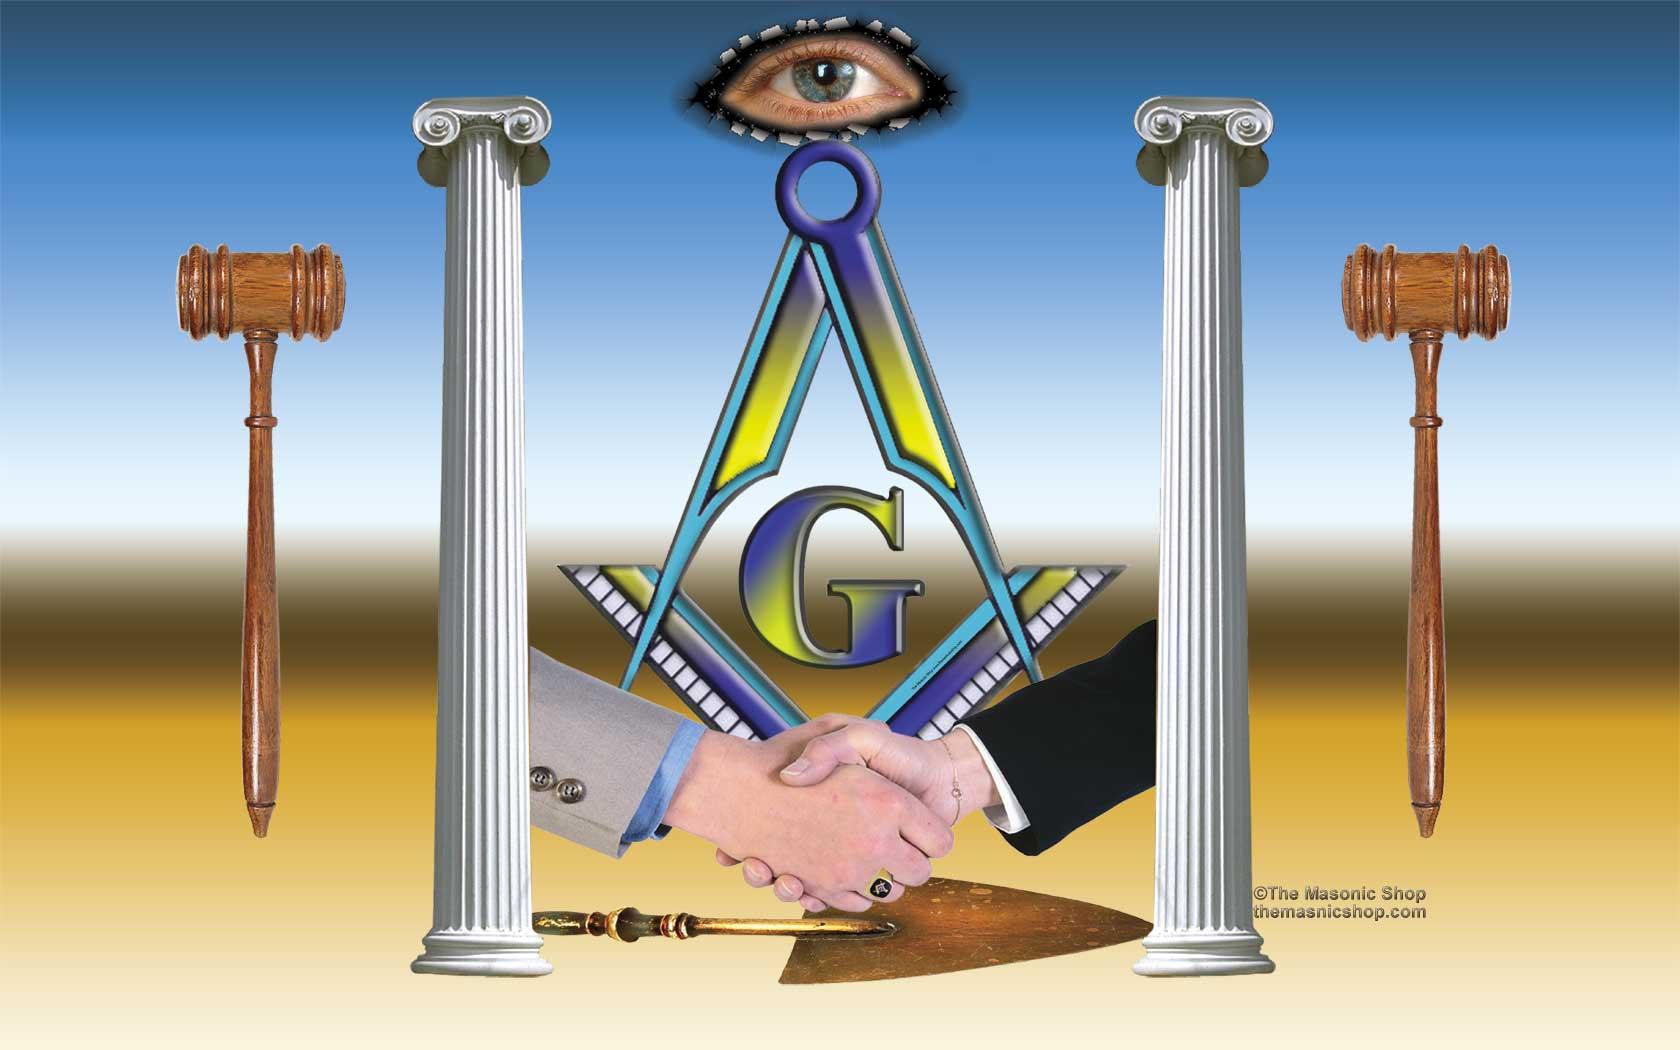 Masonic Wallpaper Courtesy of The Masonic Shop Page Four 1680x1050